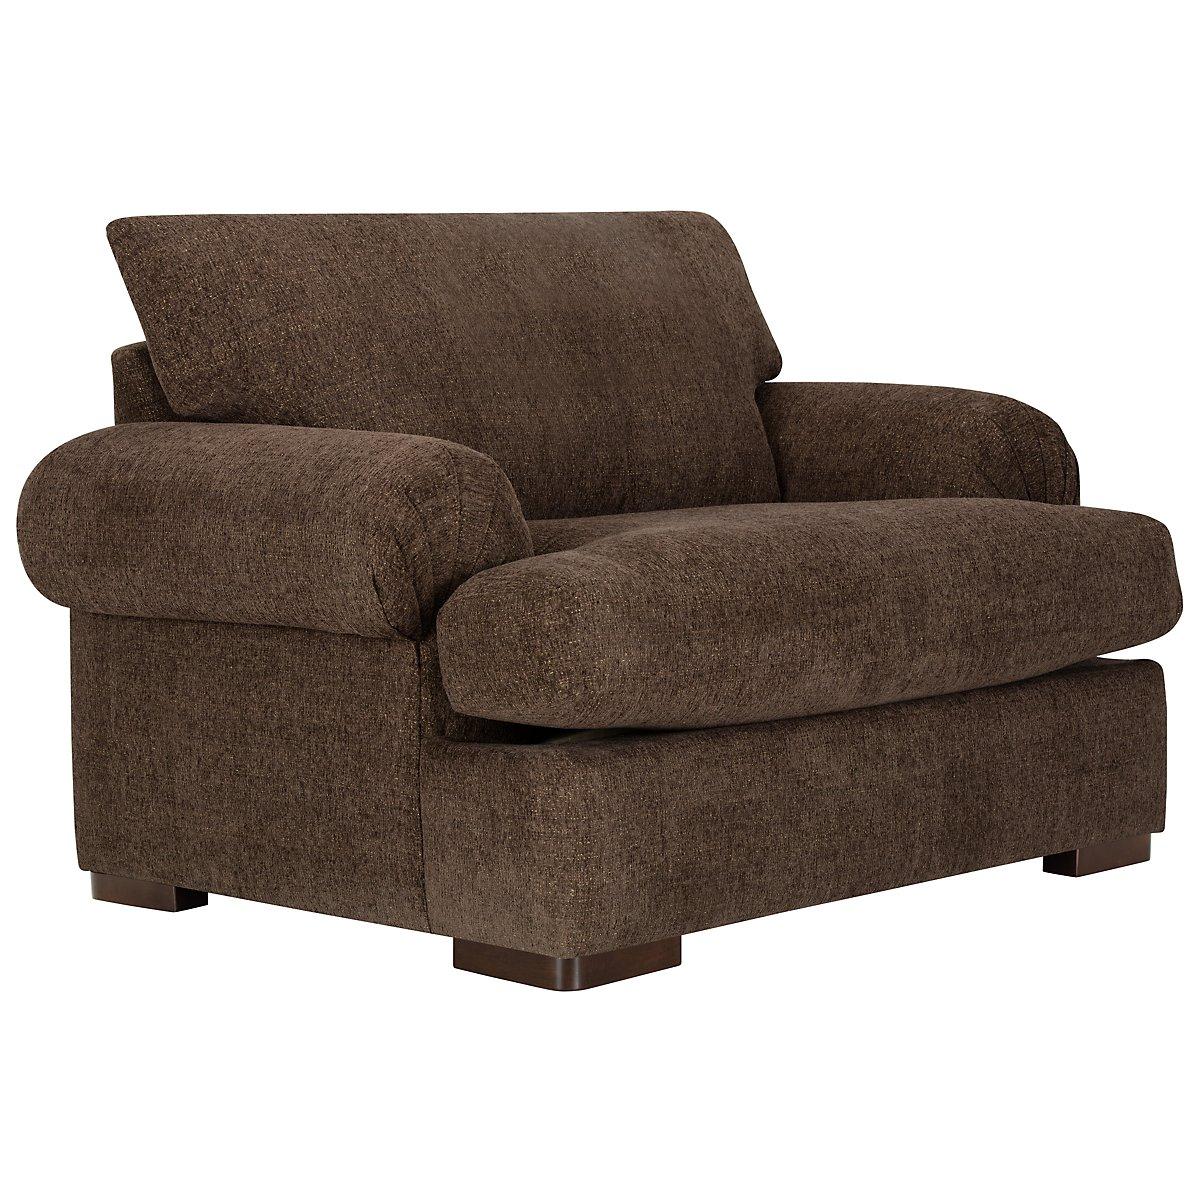 Belair Dark Brown Fabric Large Chair